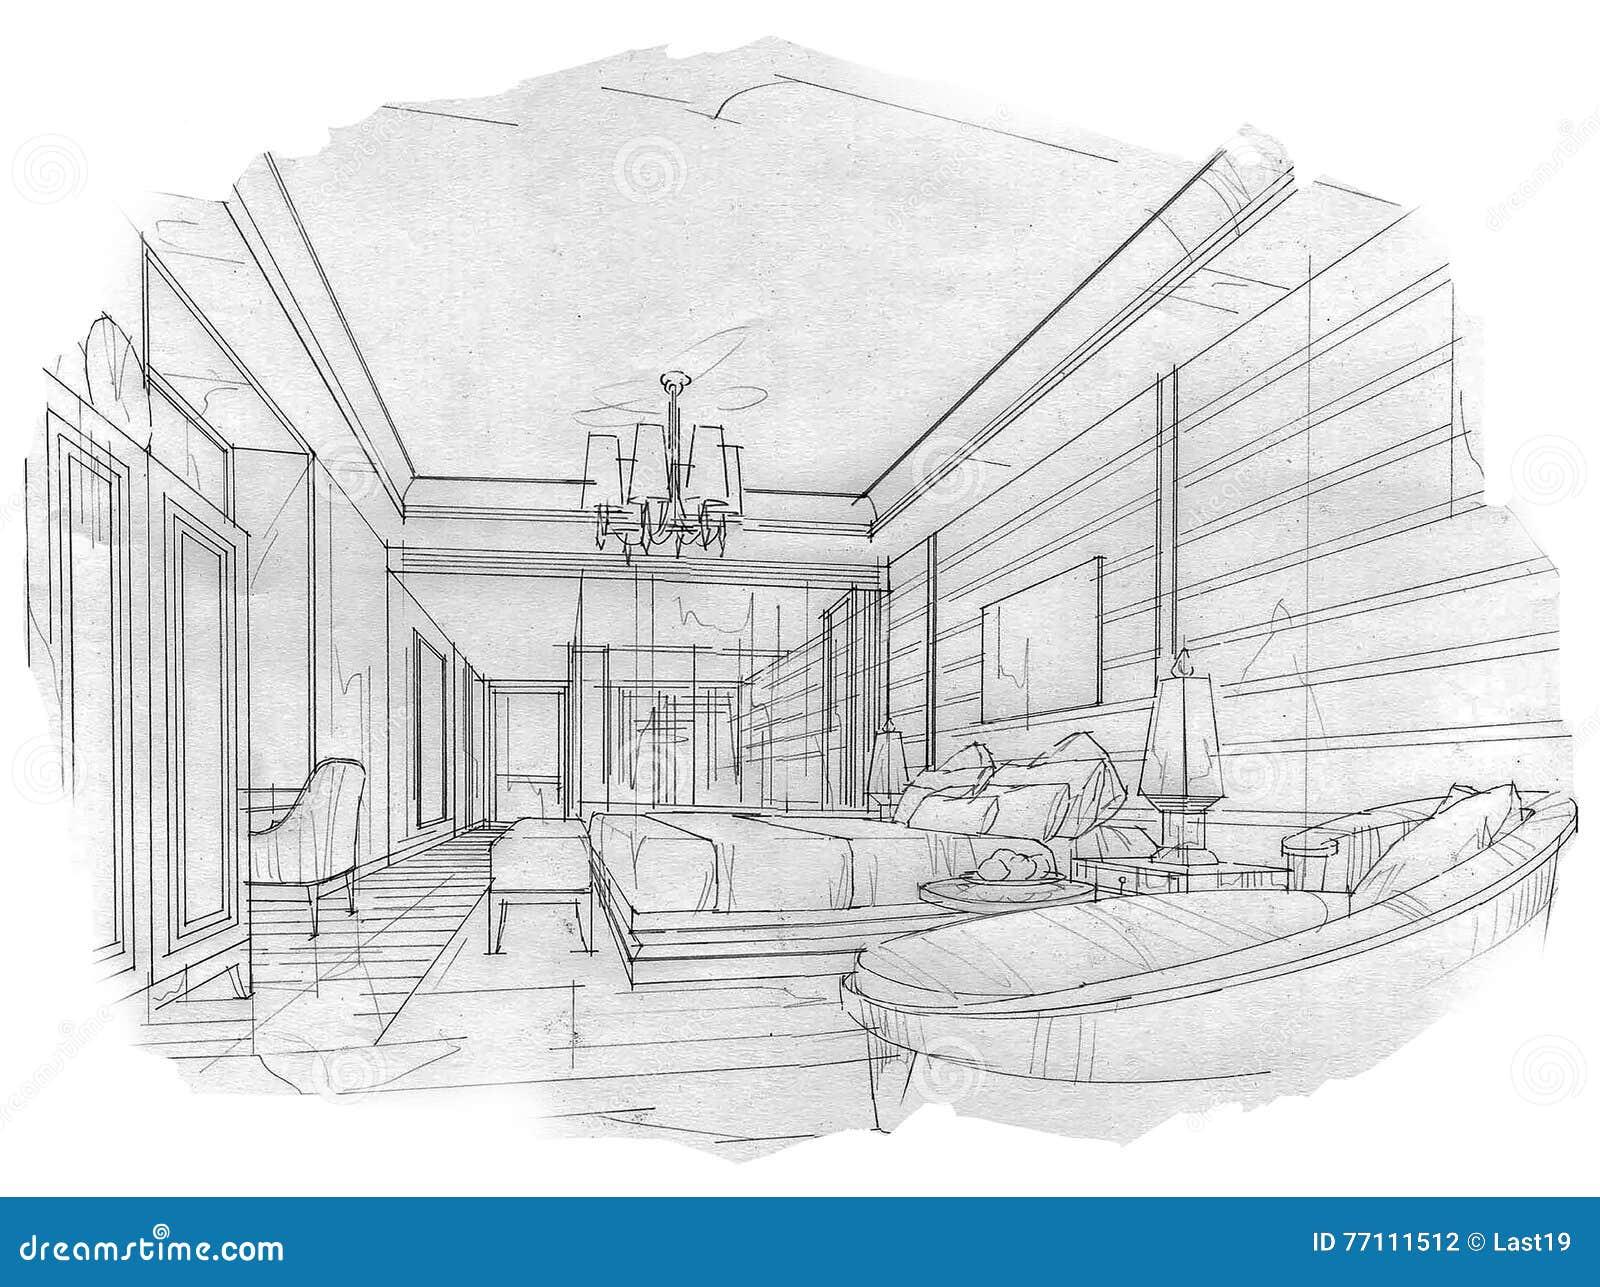 Bedroom drawing perspective - Sketch Interior Perspective Bedroom Black And White Interior Design